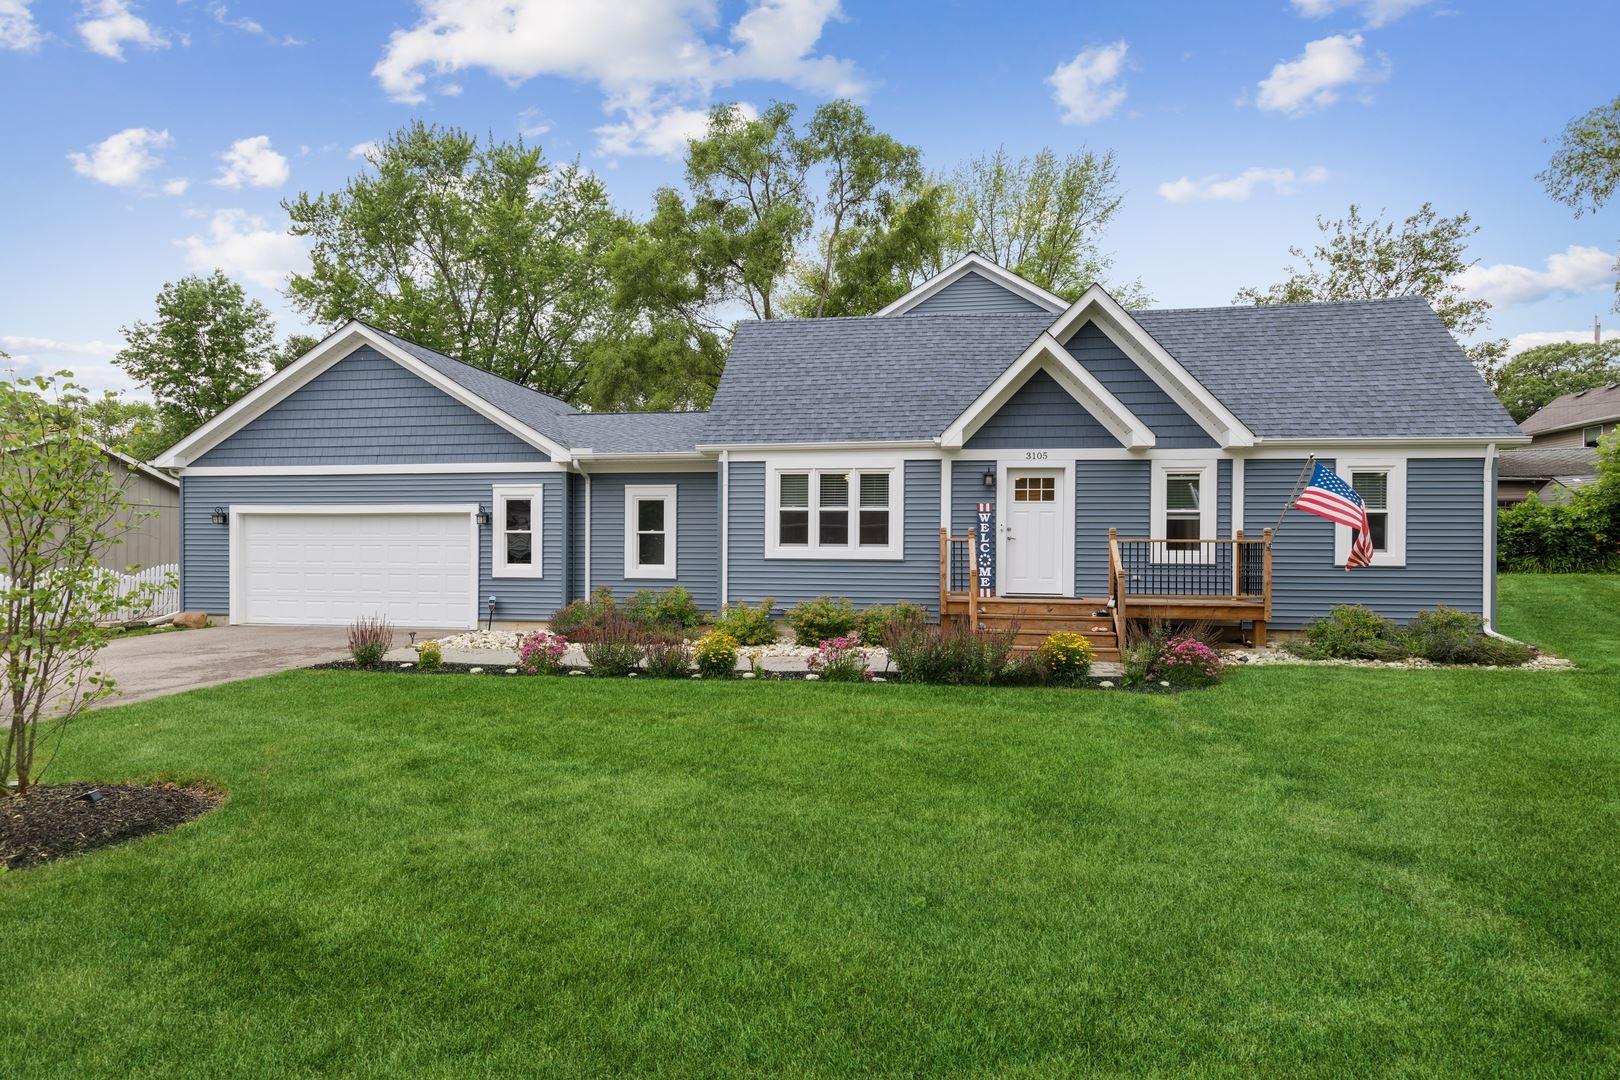 3105 Pine Terrace, Island Lake, IL 60042 - #: 11134764